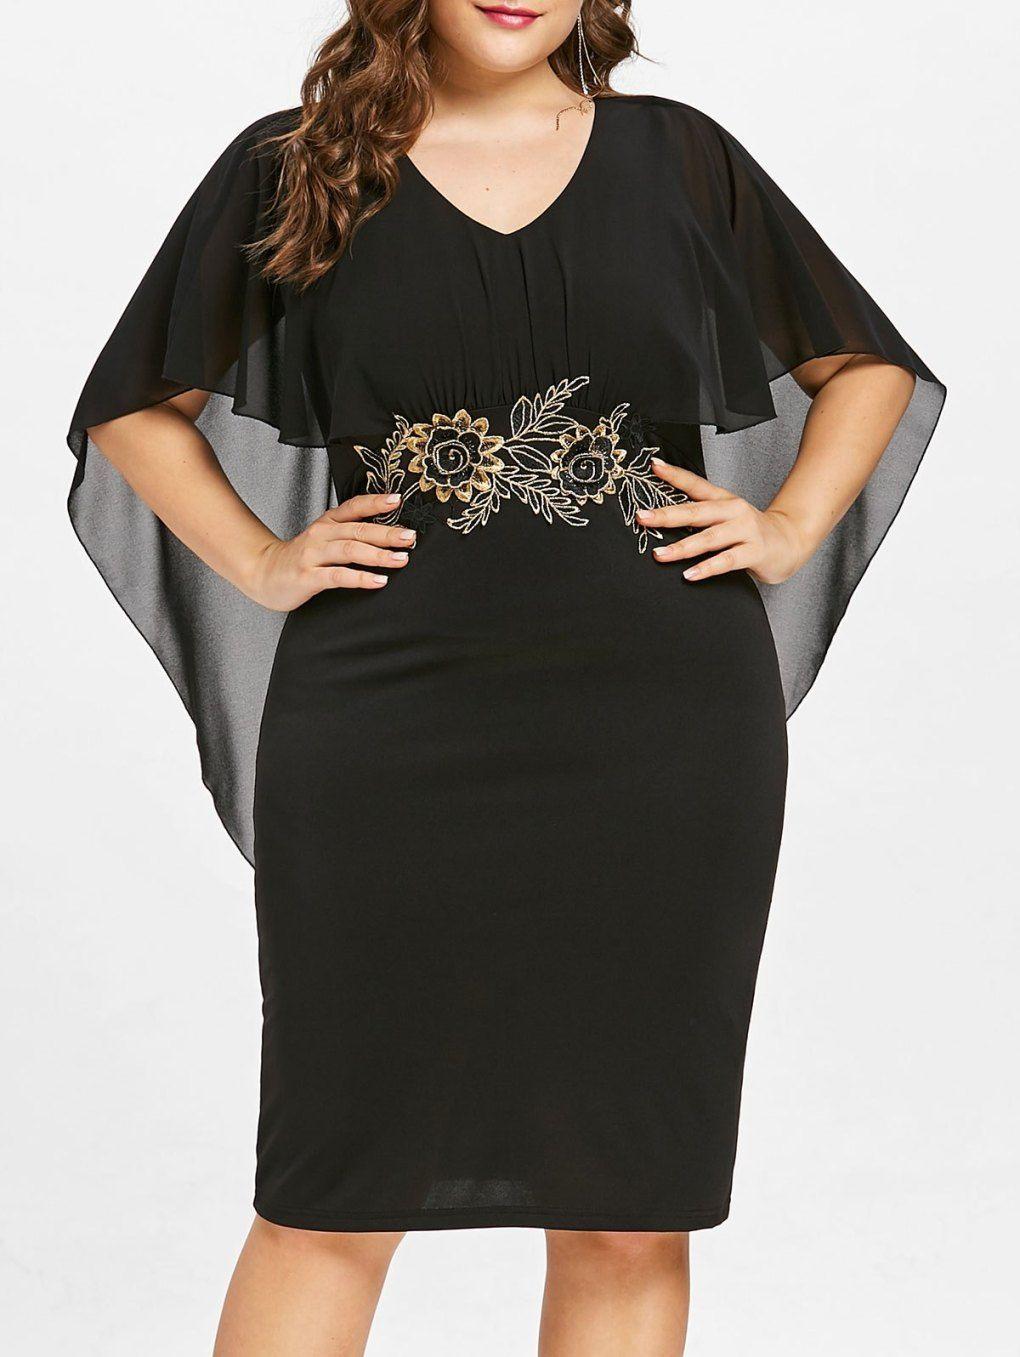 Account Suspended Plus Size Black Dresses Plus Size Formal Dresses Evening Dresses Plus Size [ 1357 x 1020 Pixel ]